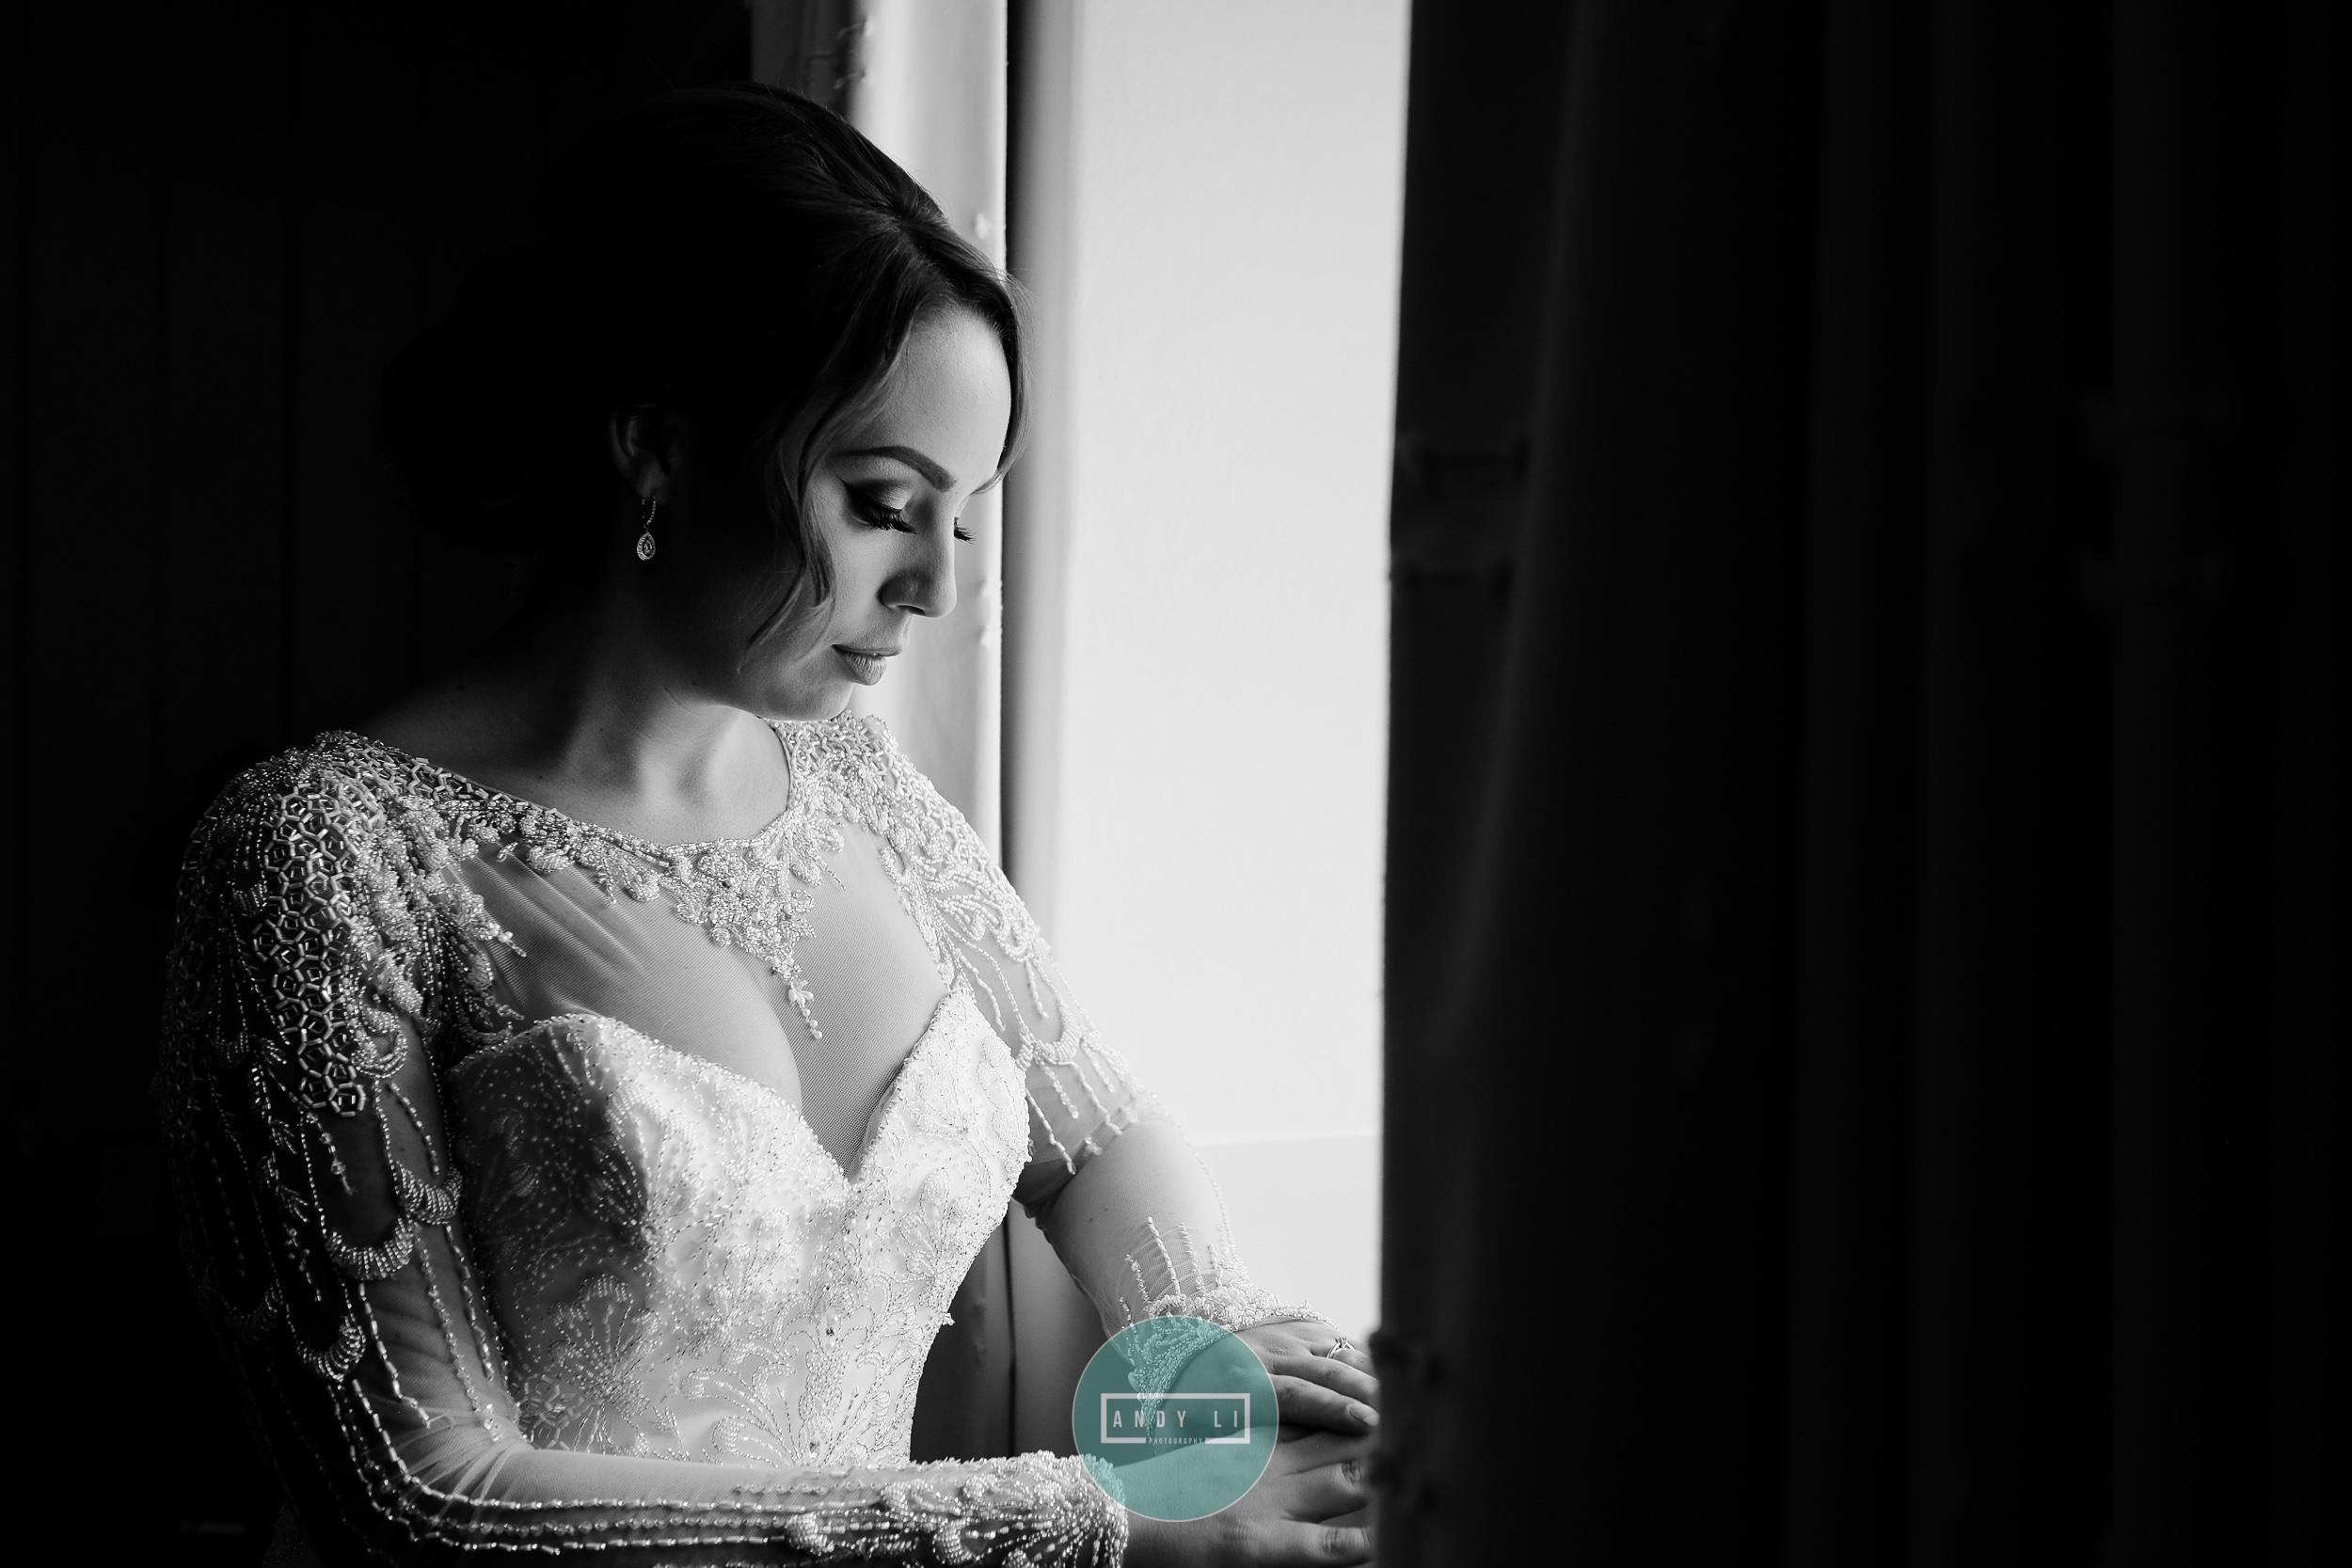 Pimhill Barn Wedding Photographer-029-DSCF9844.jpg